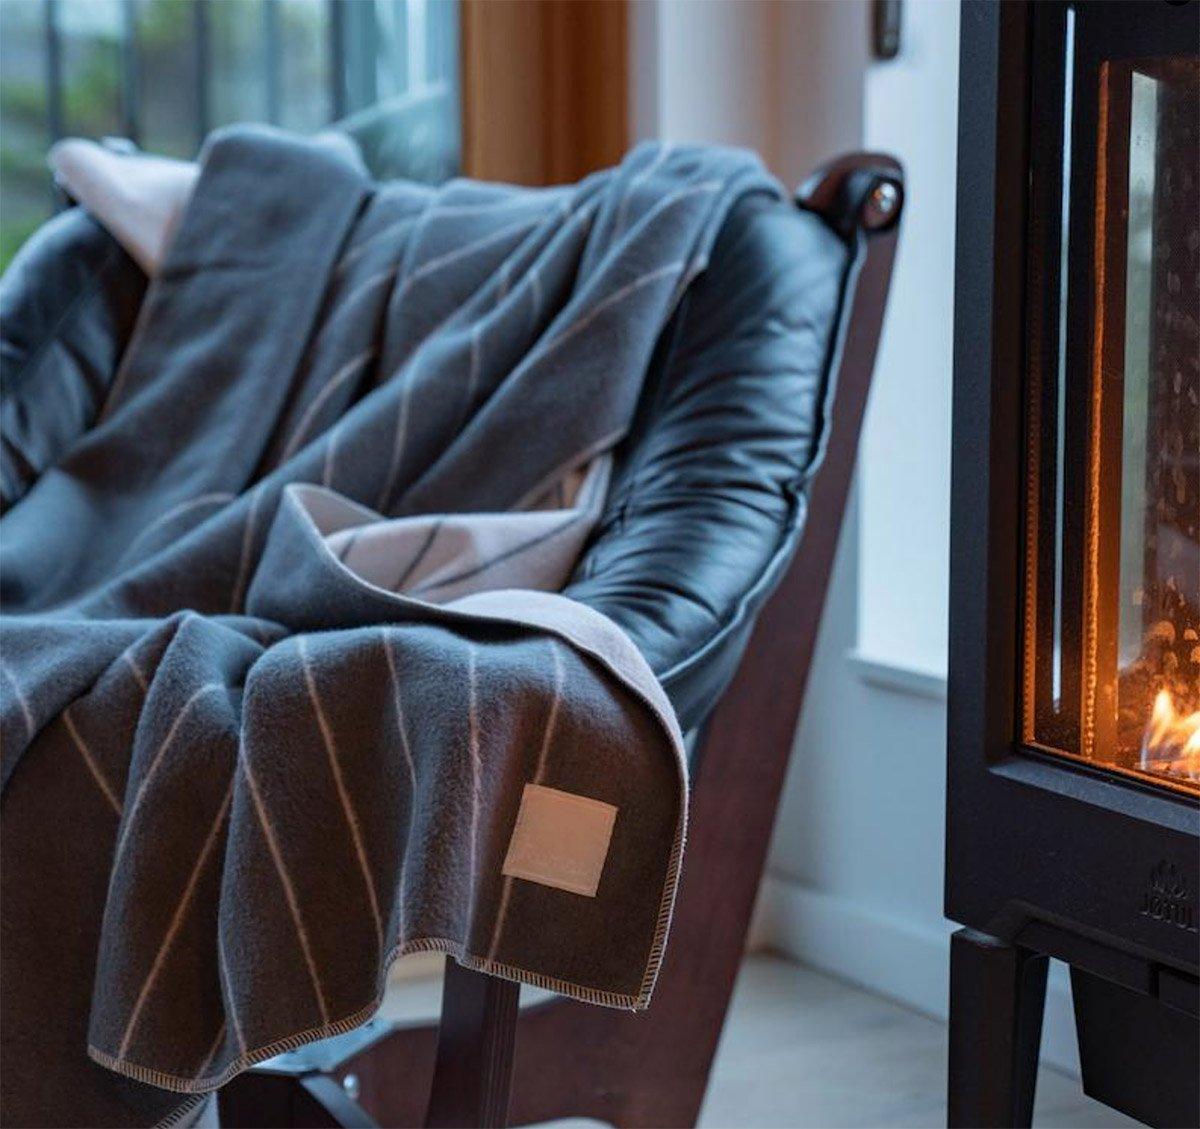 Warm Up for Winter with Rumpl's Merino Wool Blankets at werd.com